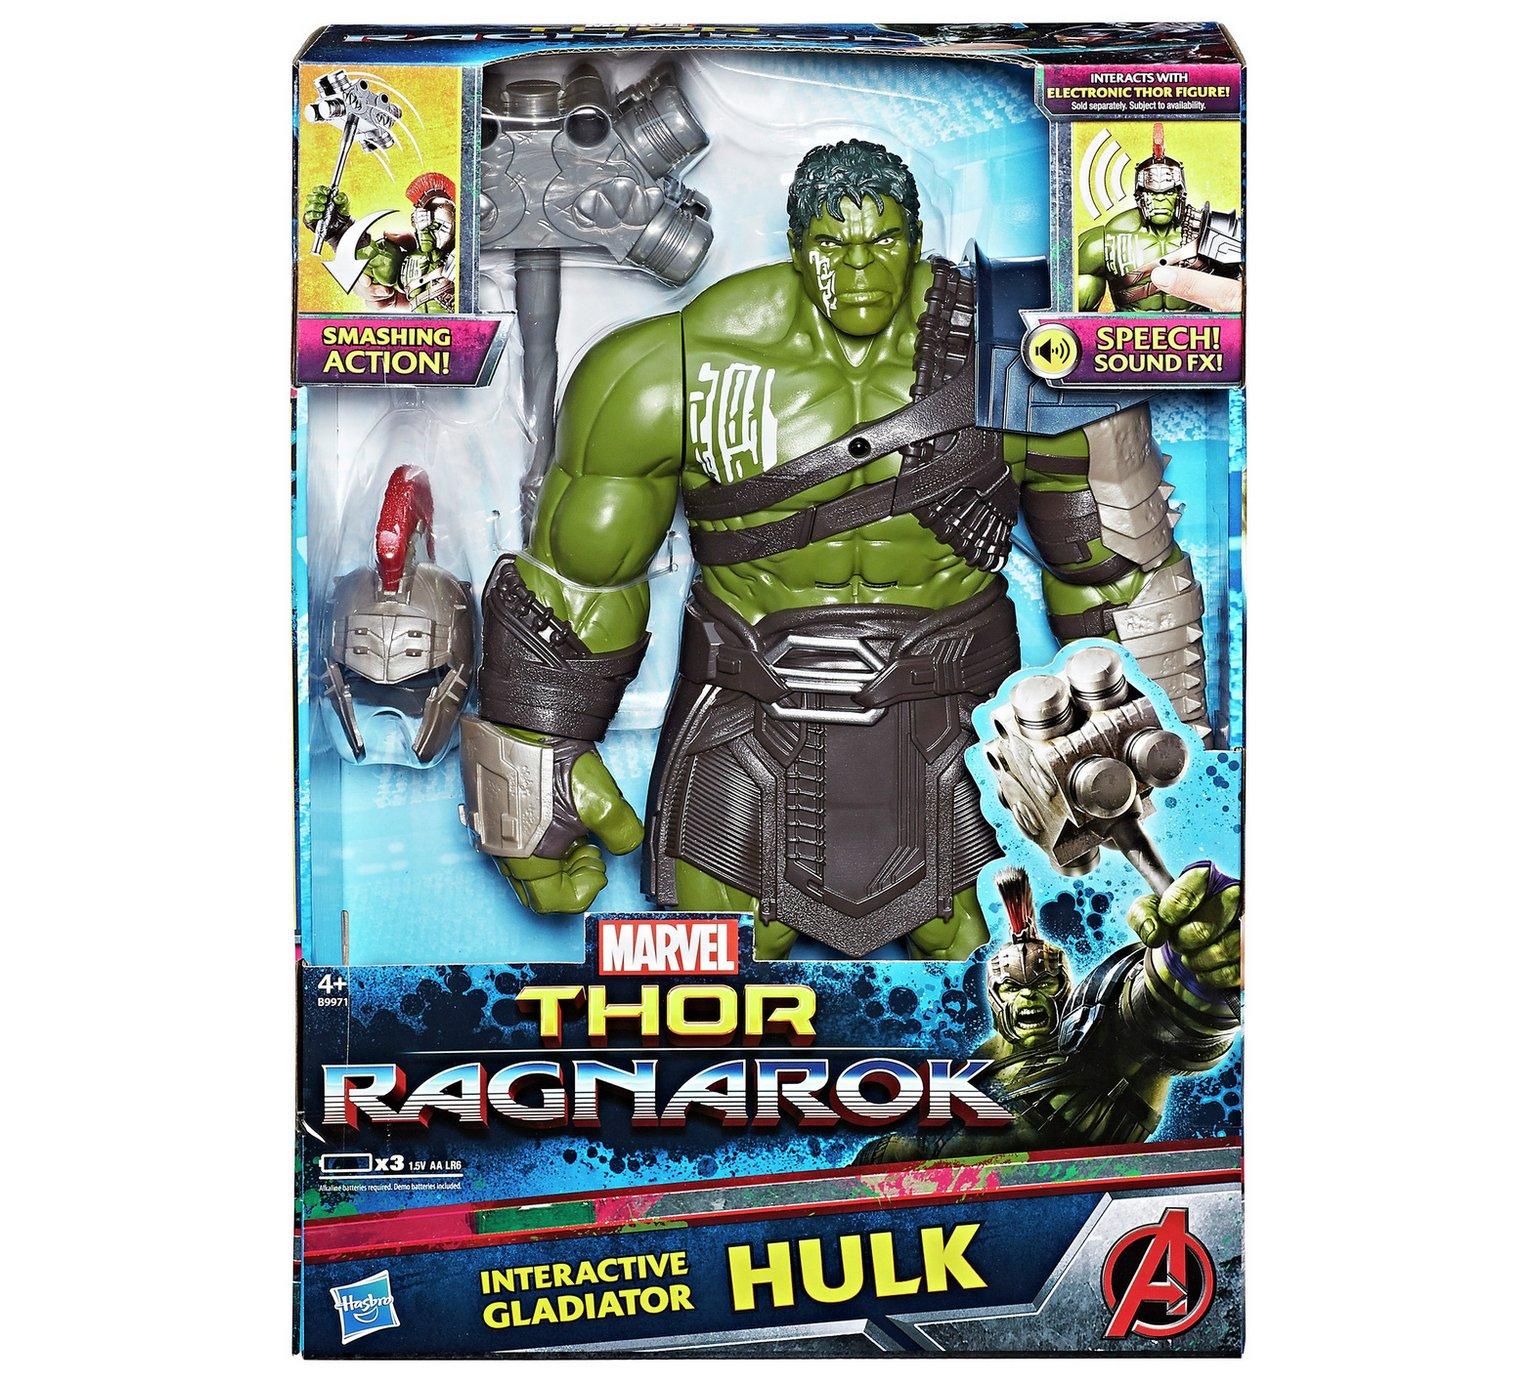 "Thor Ragnorok - 12"" Interactive Gladiator Hulk Figure £15 instore (B&M)"